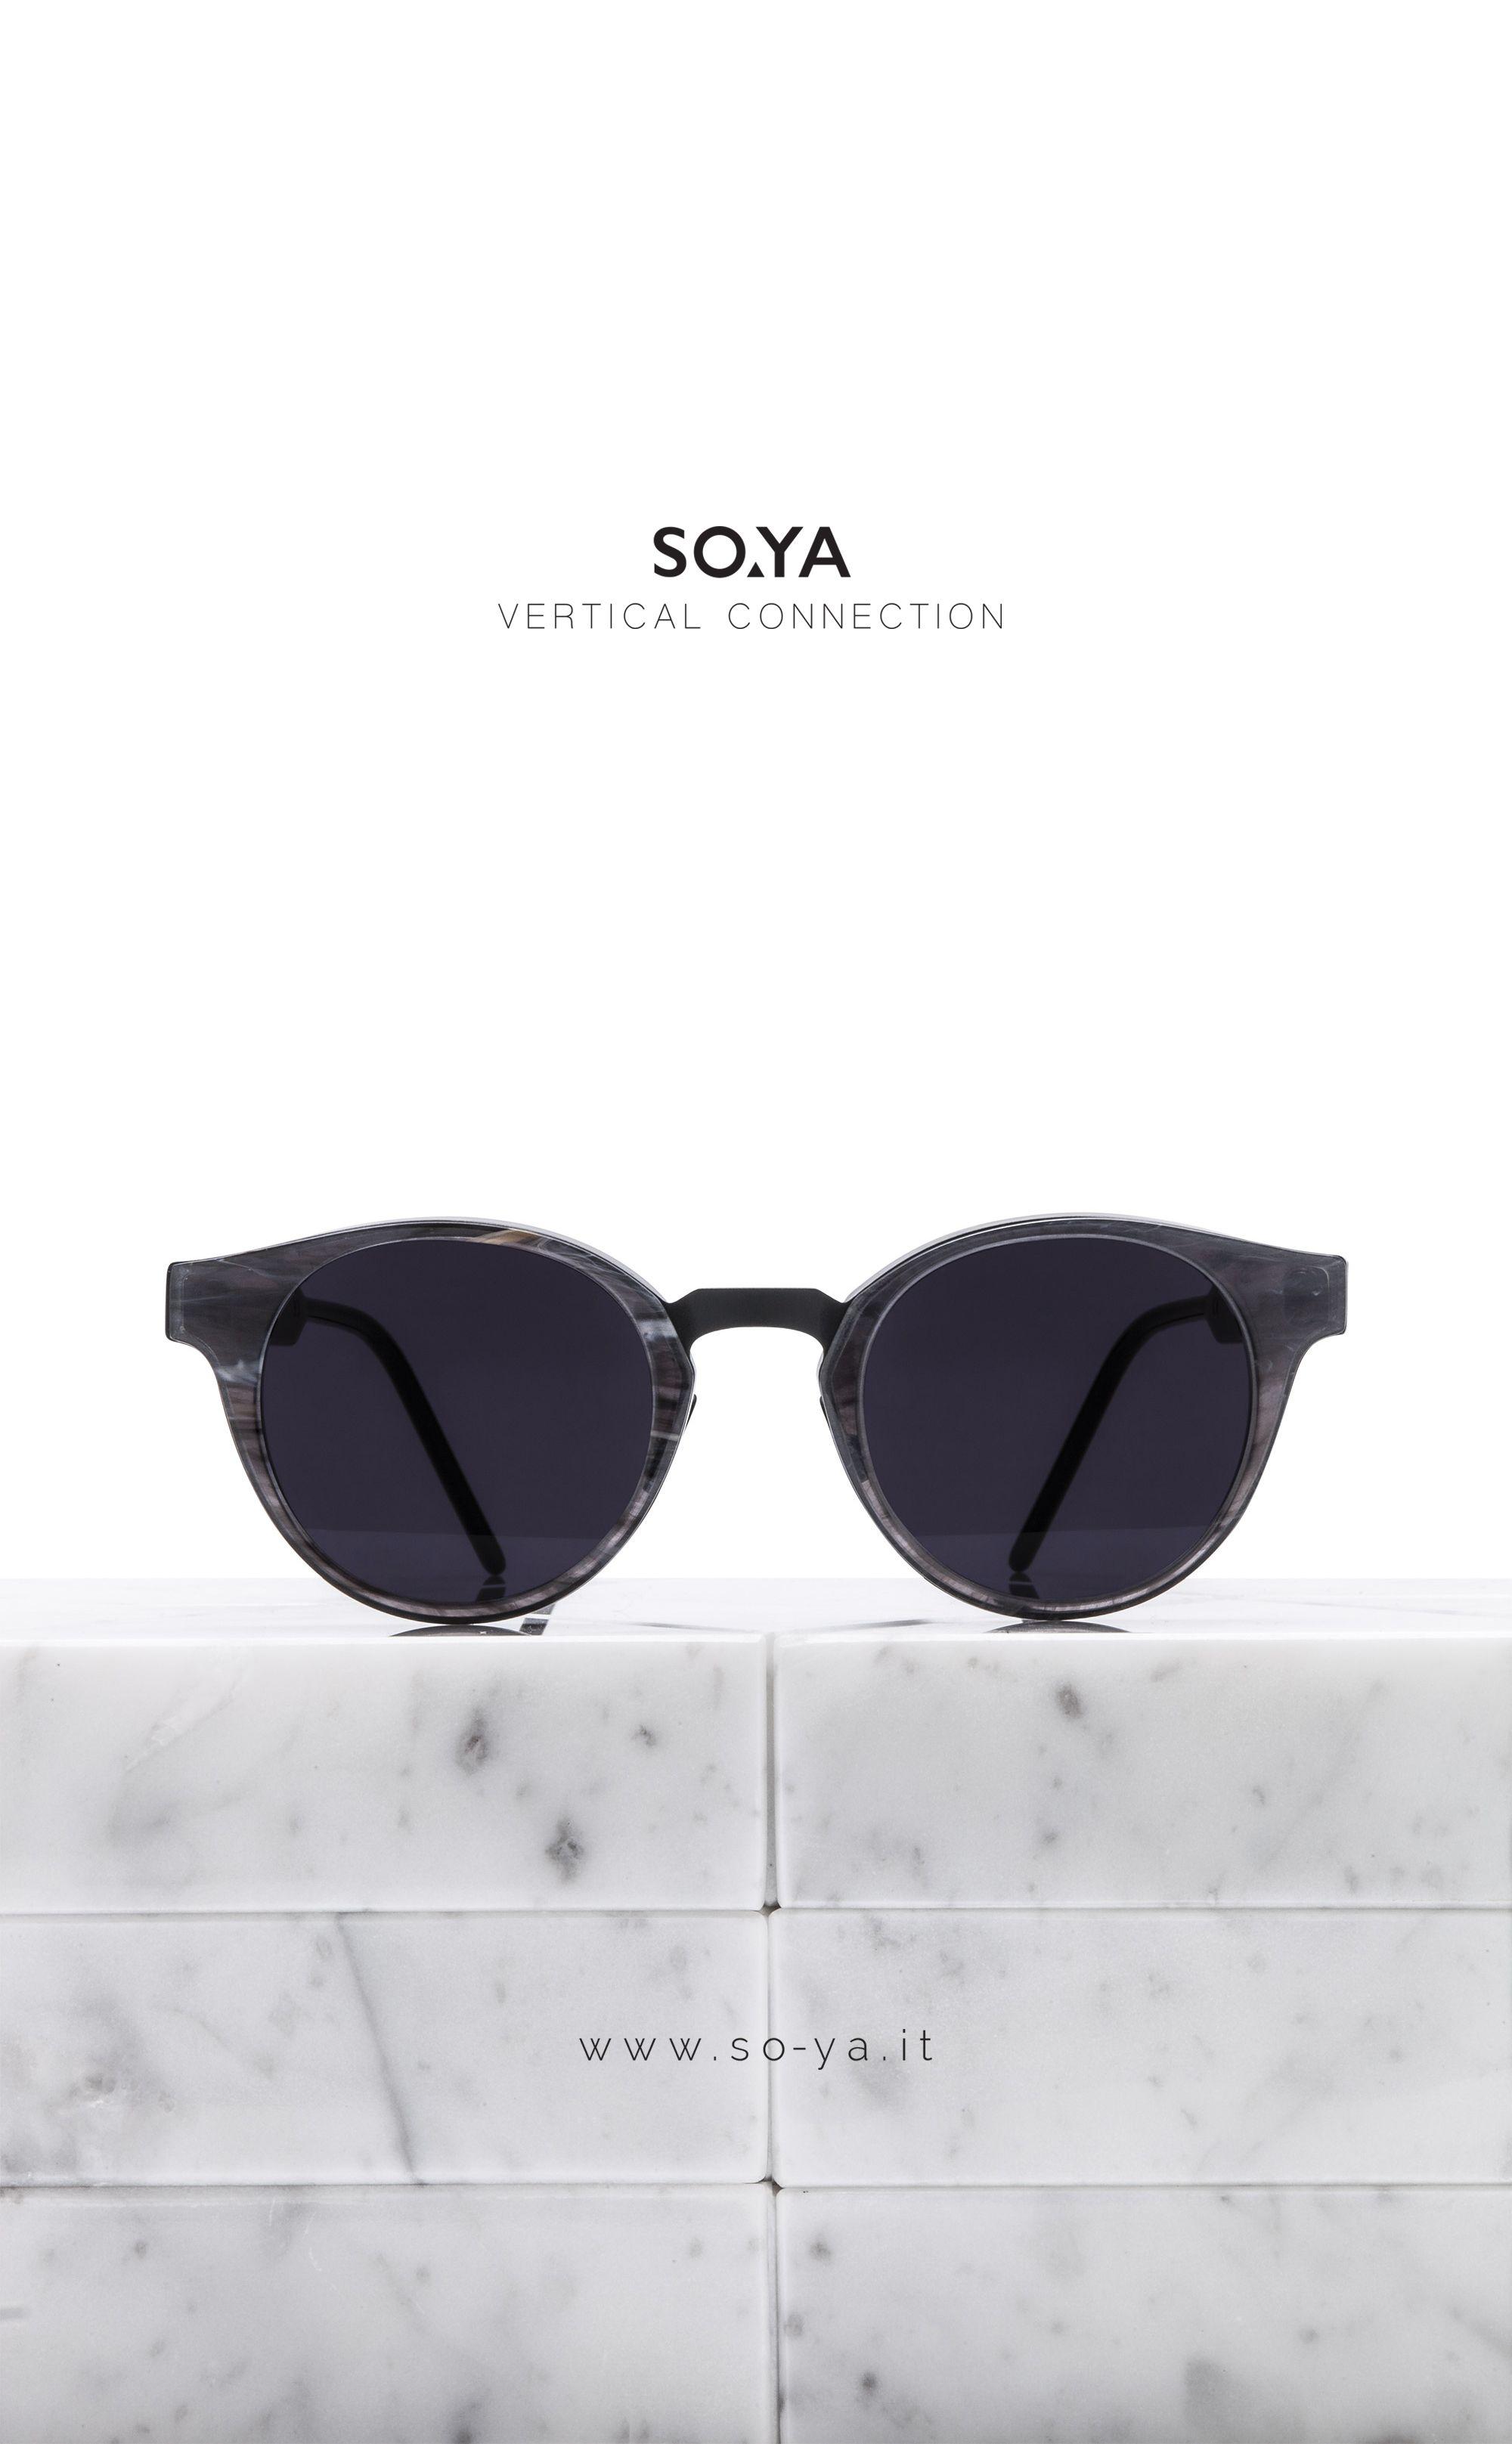 Williams sunglasses - Black So.Ya GCOLwE